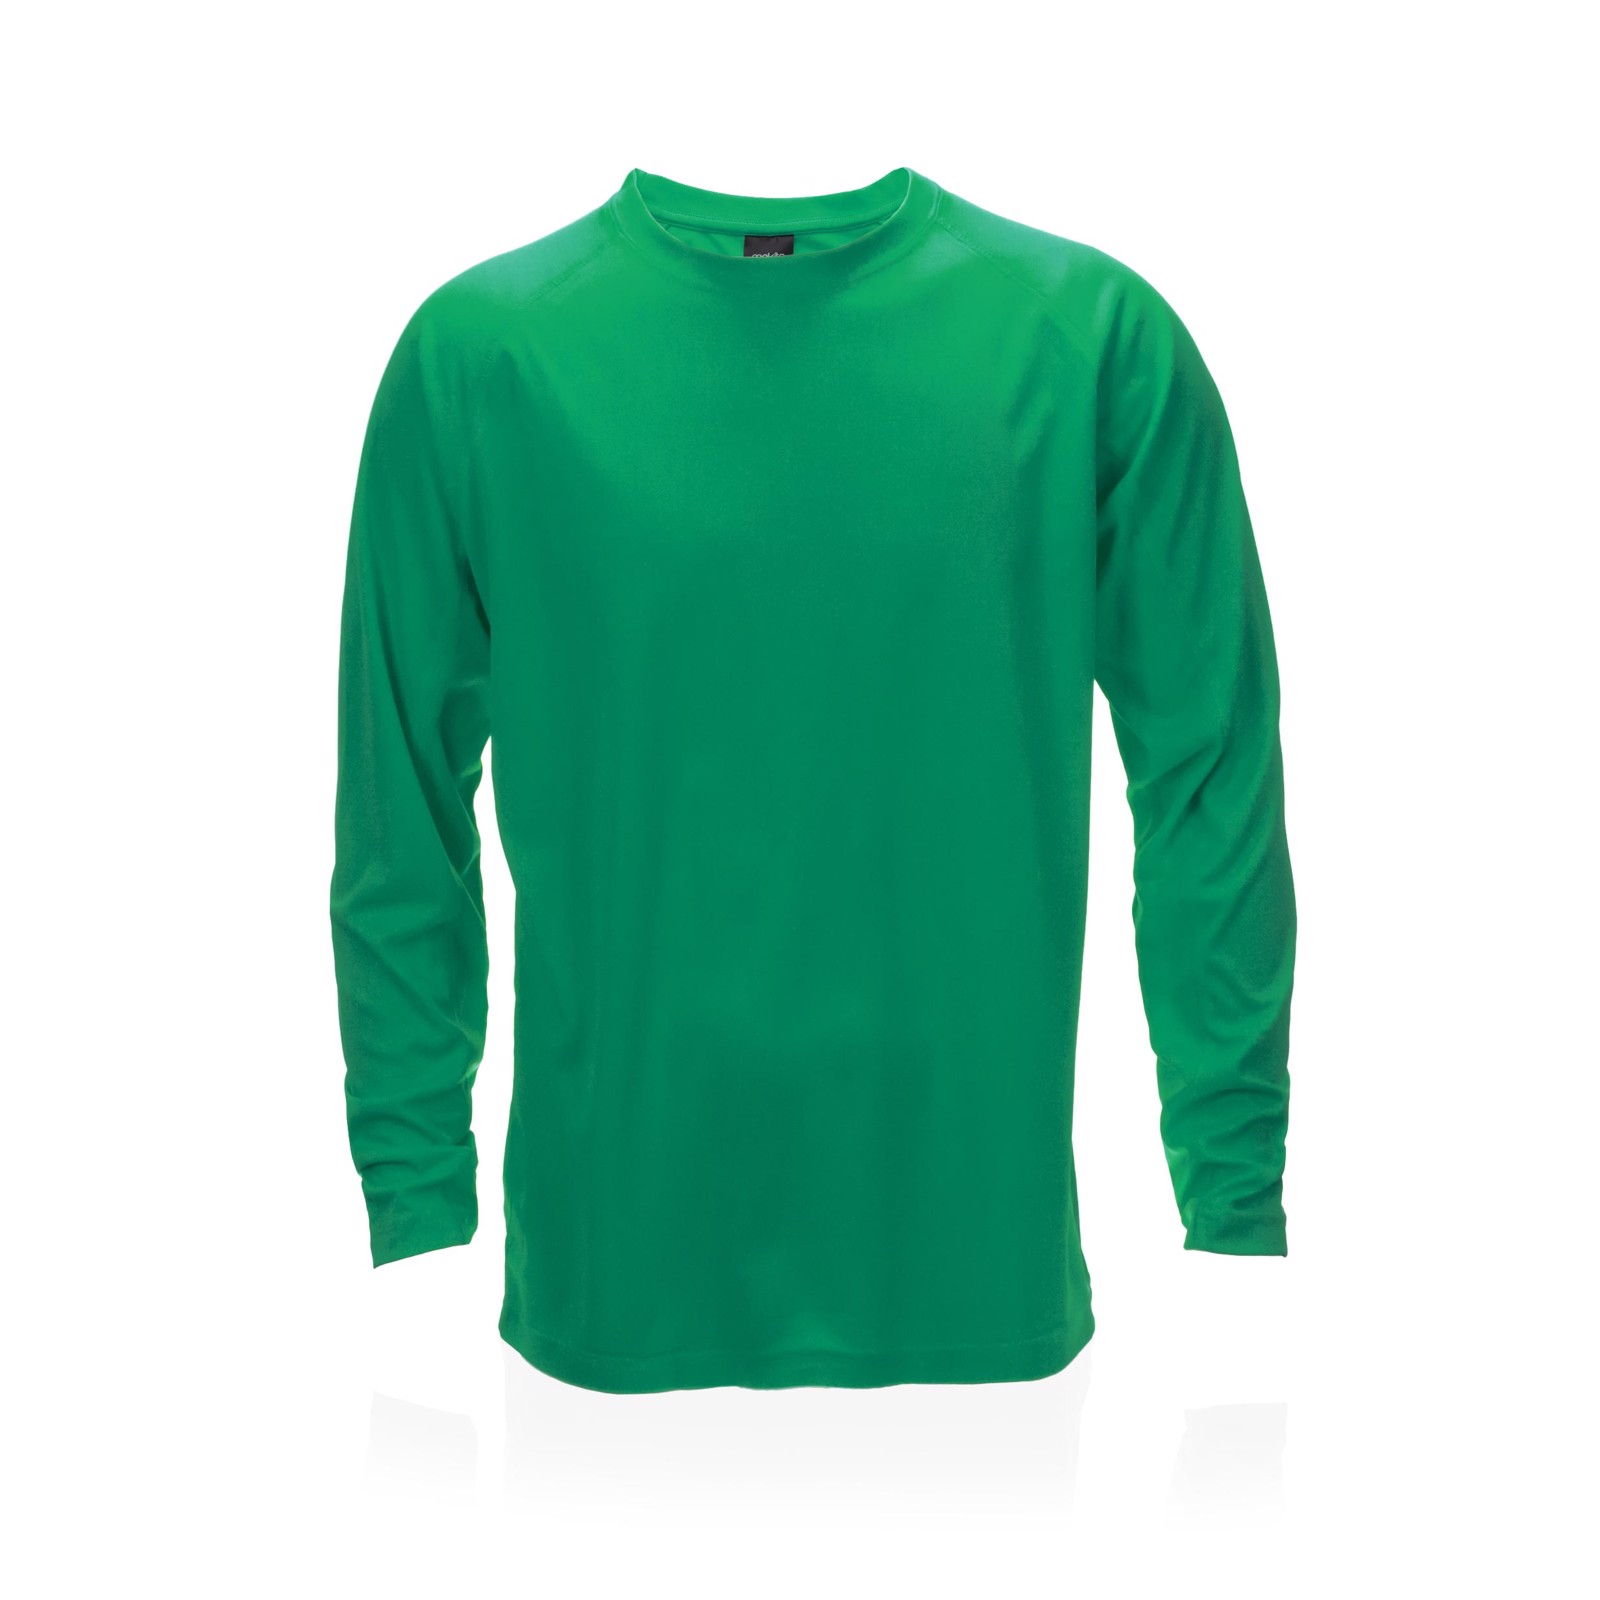 Camiseta Adulto Tecnik Maik - Verde / M